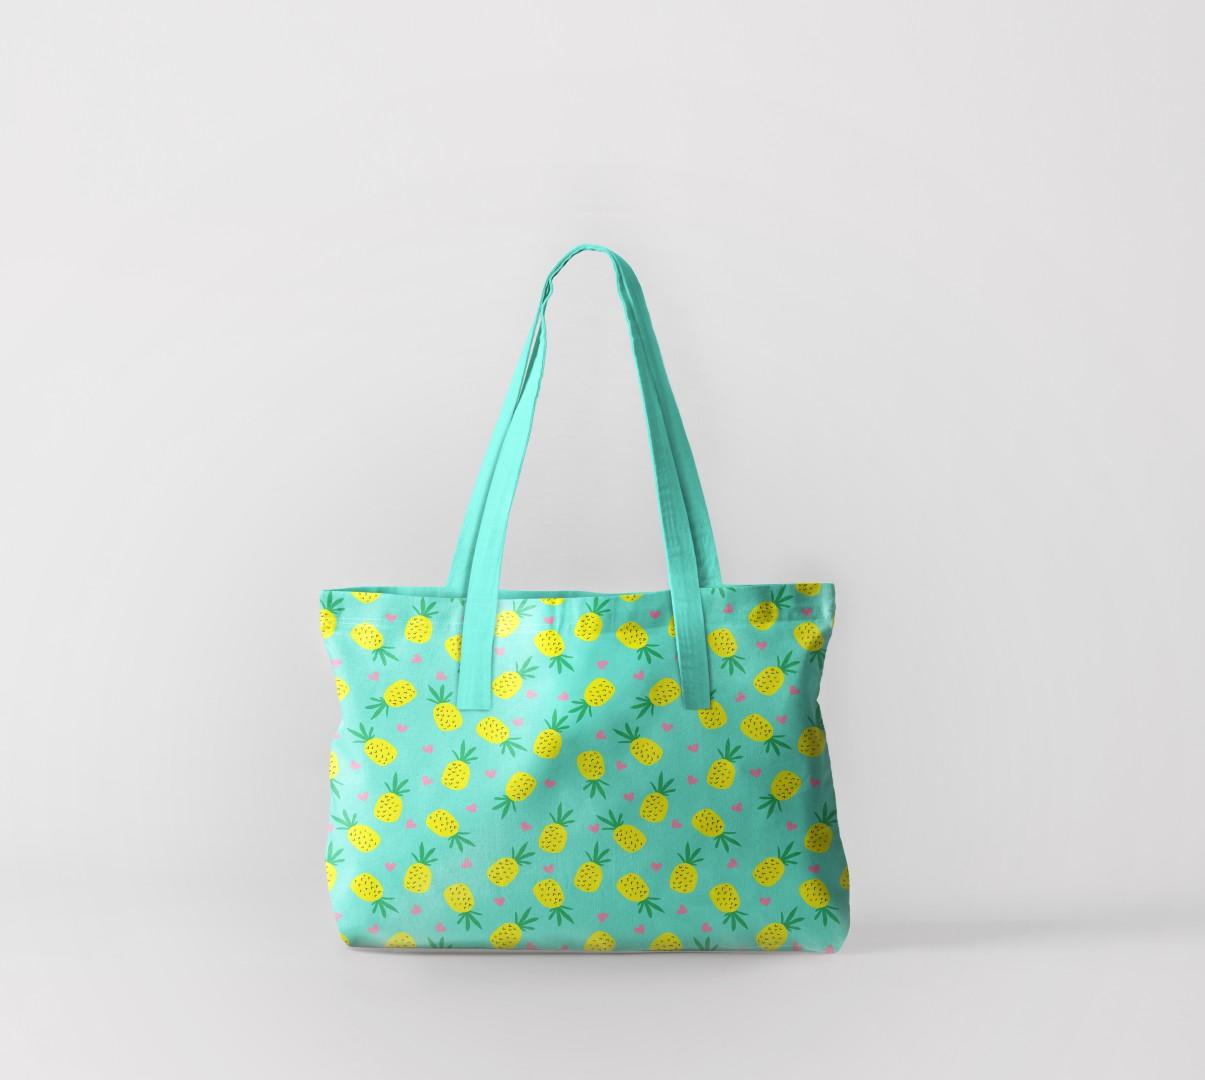 Пляжная сумка Яркие ананасы (50х40 см) Олимп Текстиль oli732615